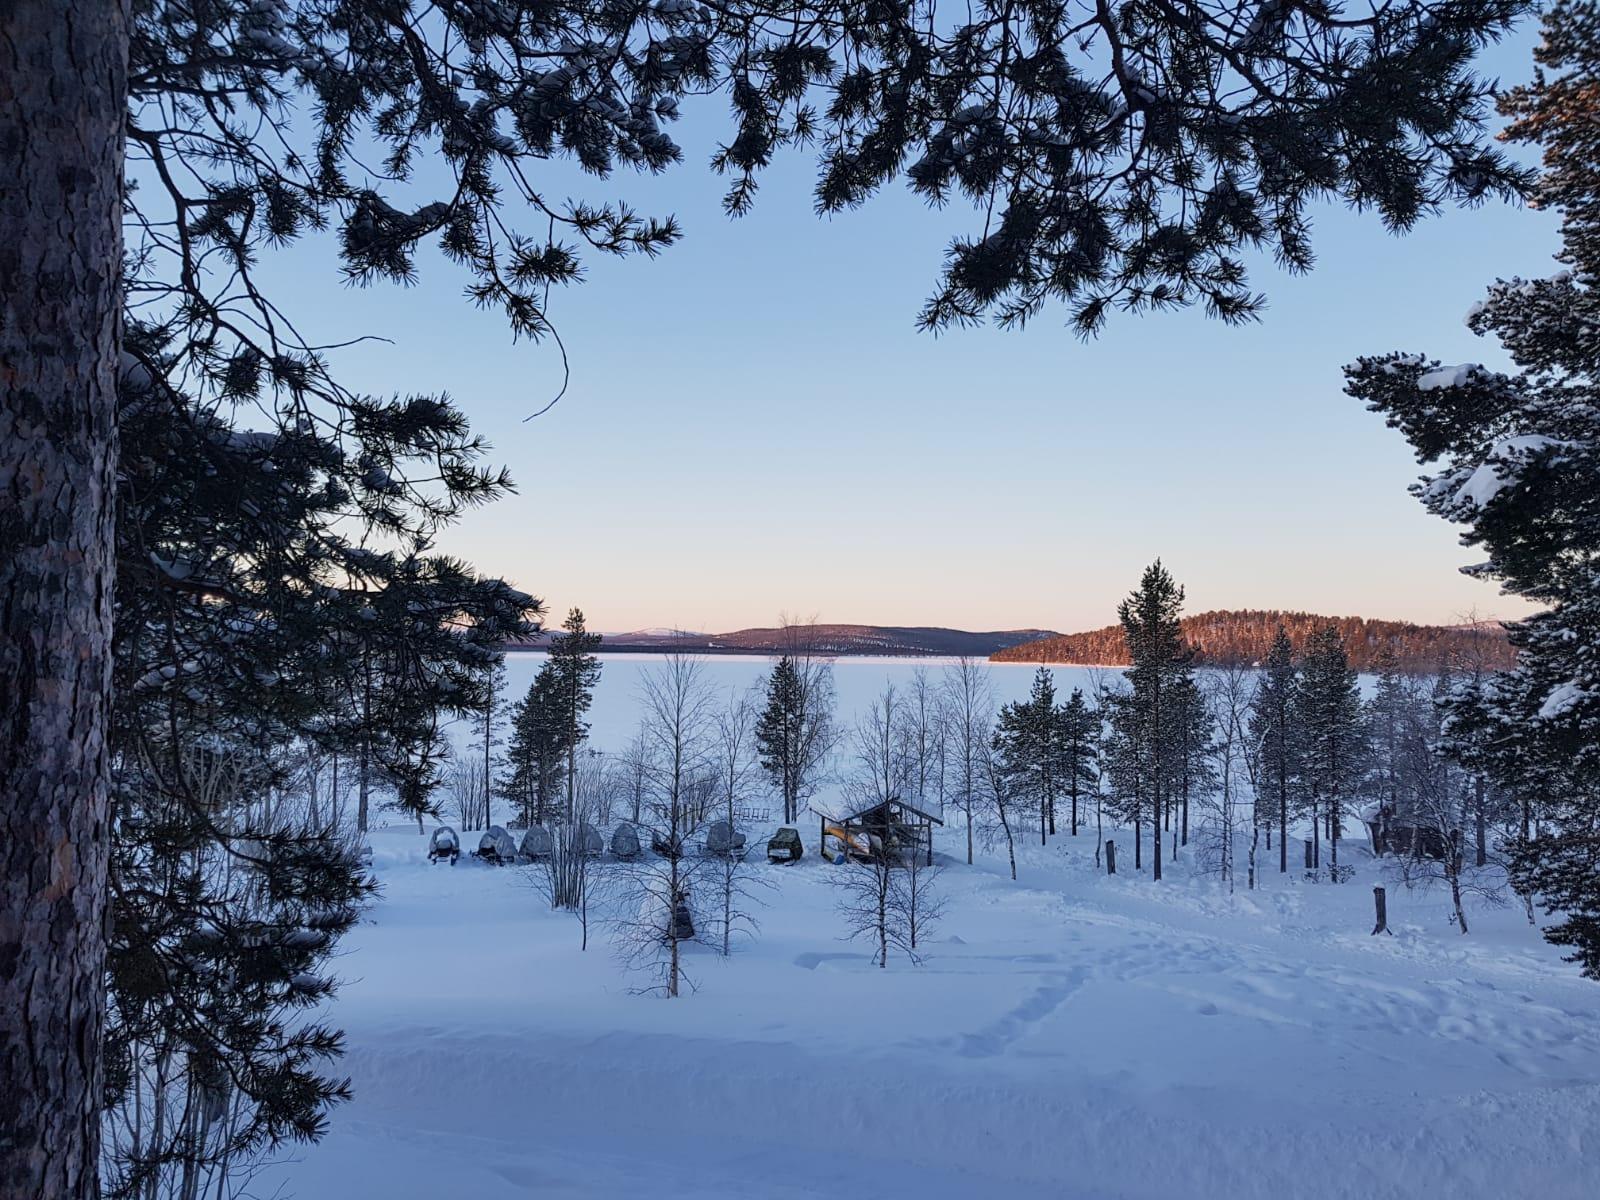 Winter Bushcraft in the Northern Forest